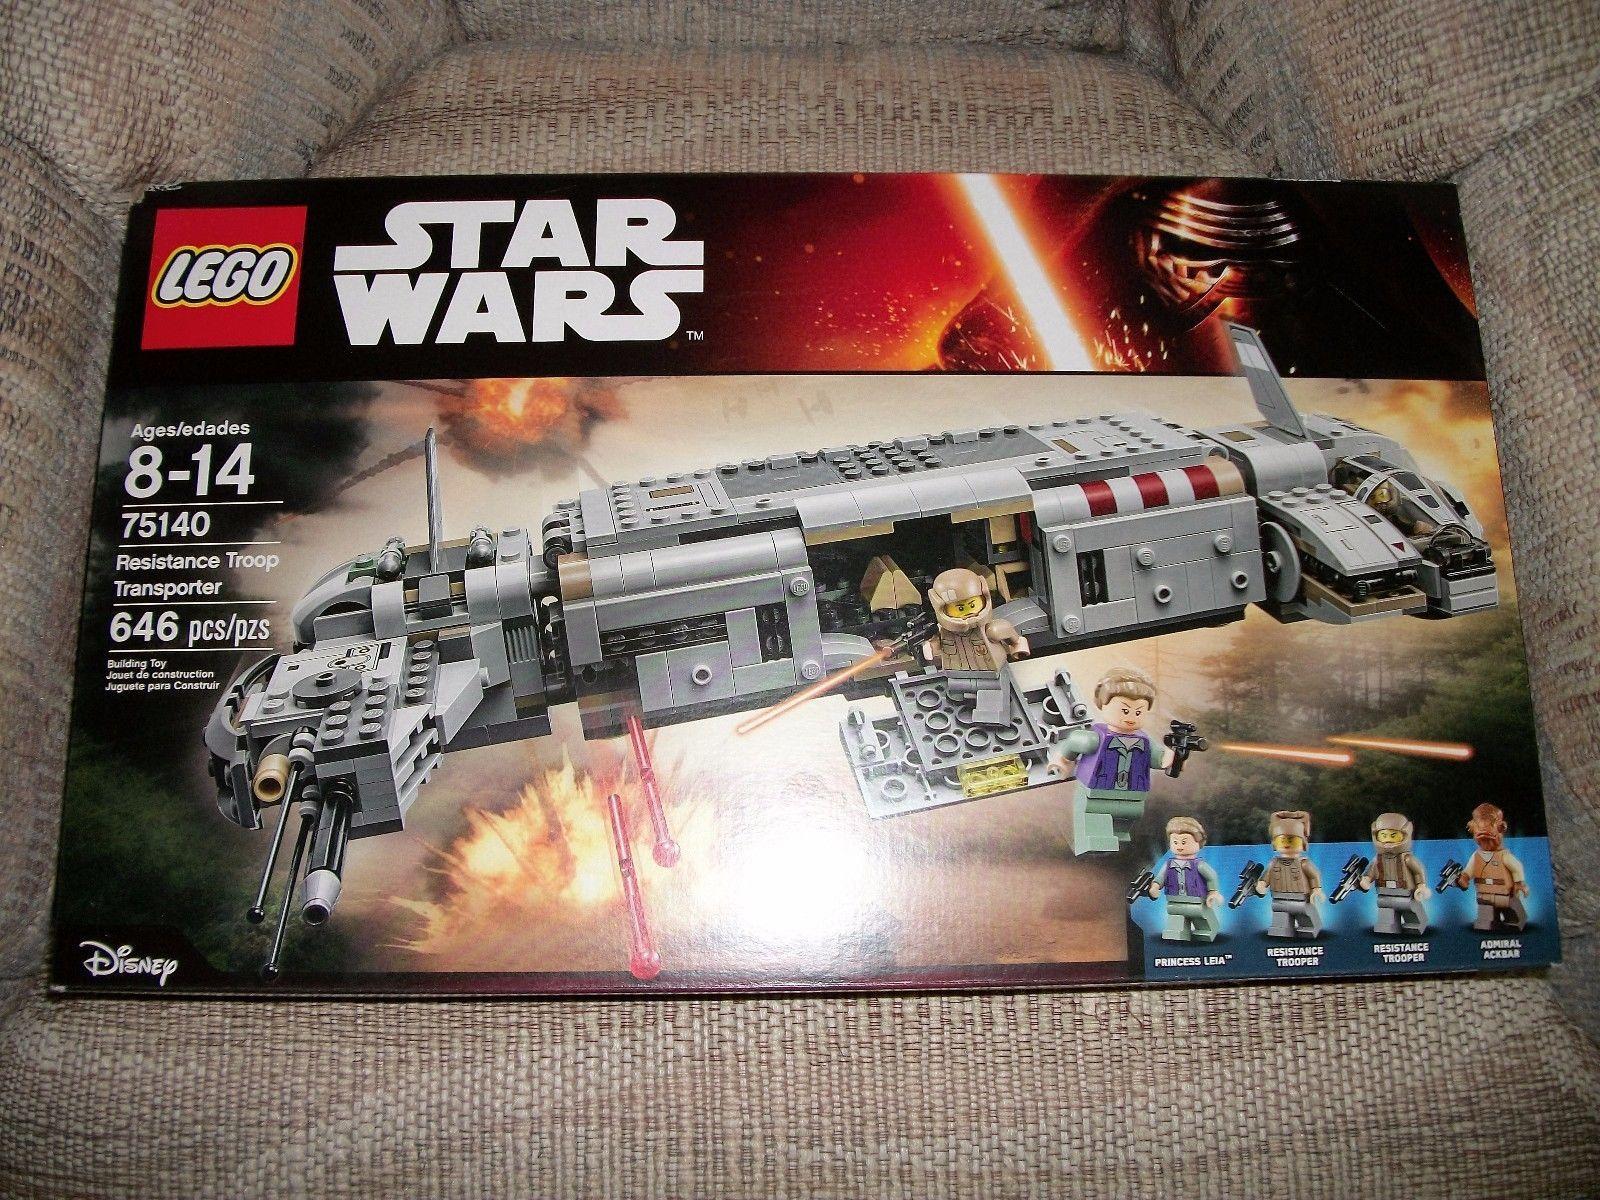 Resistance Troop Transporter Star Wars LEGO 75140 Instructions ONLY